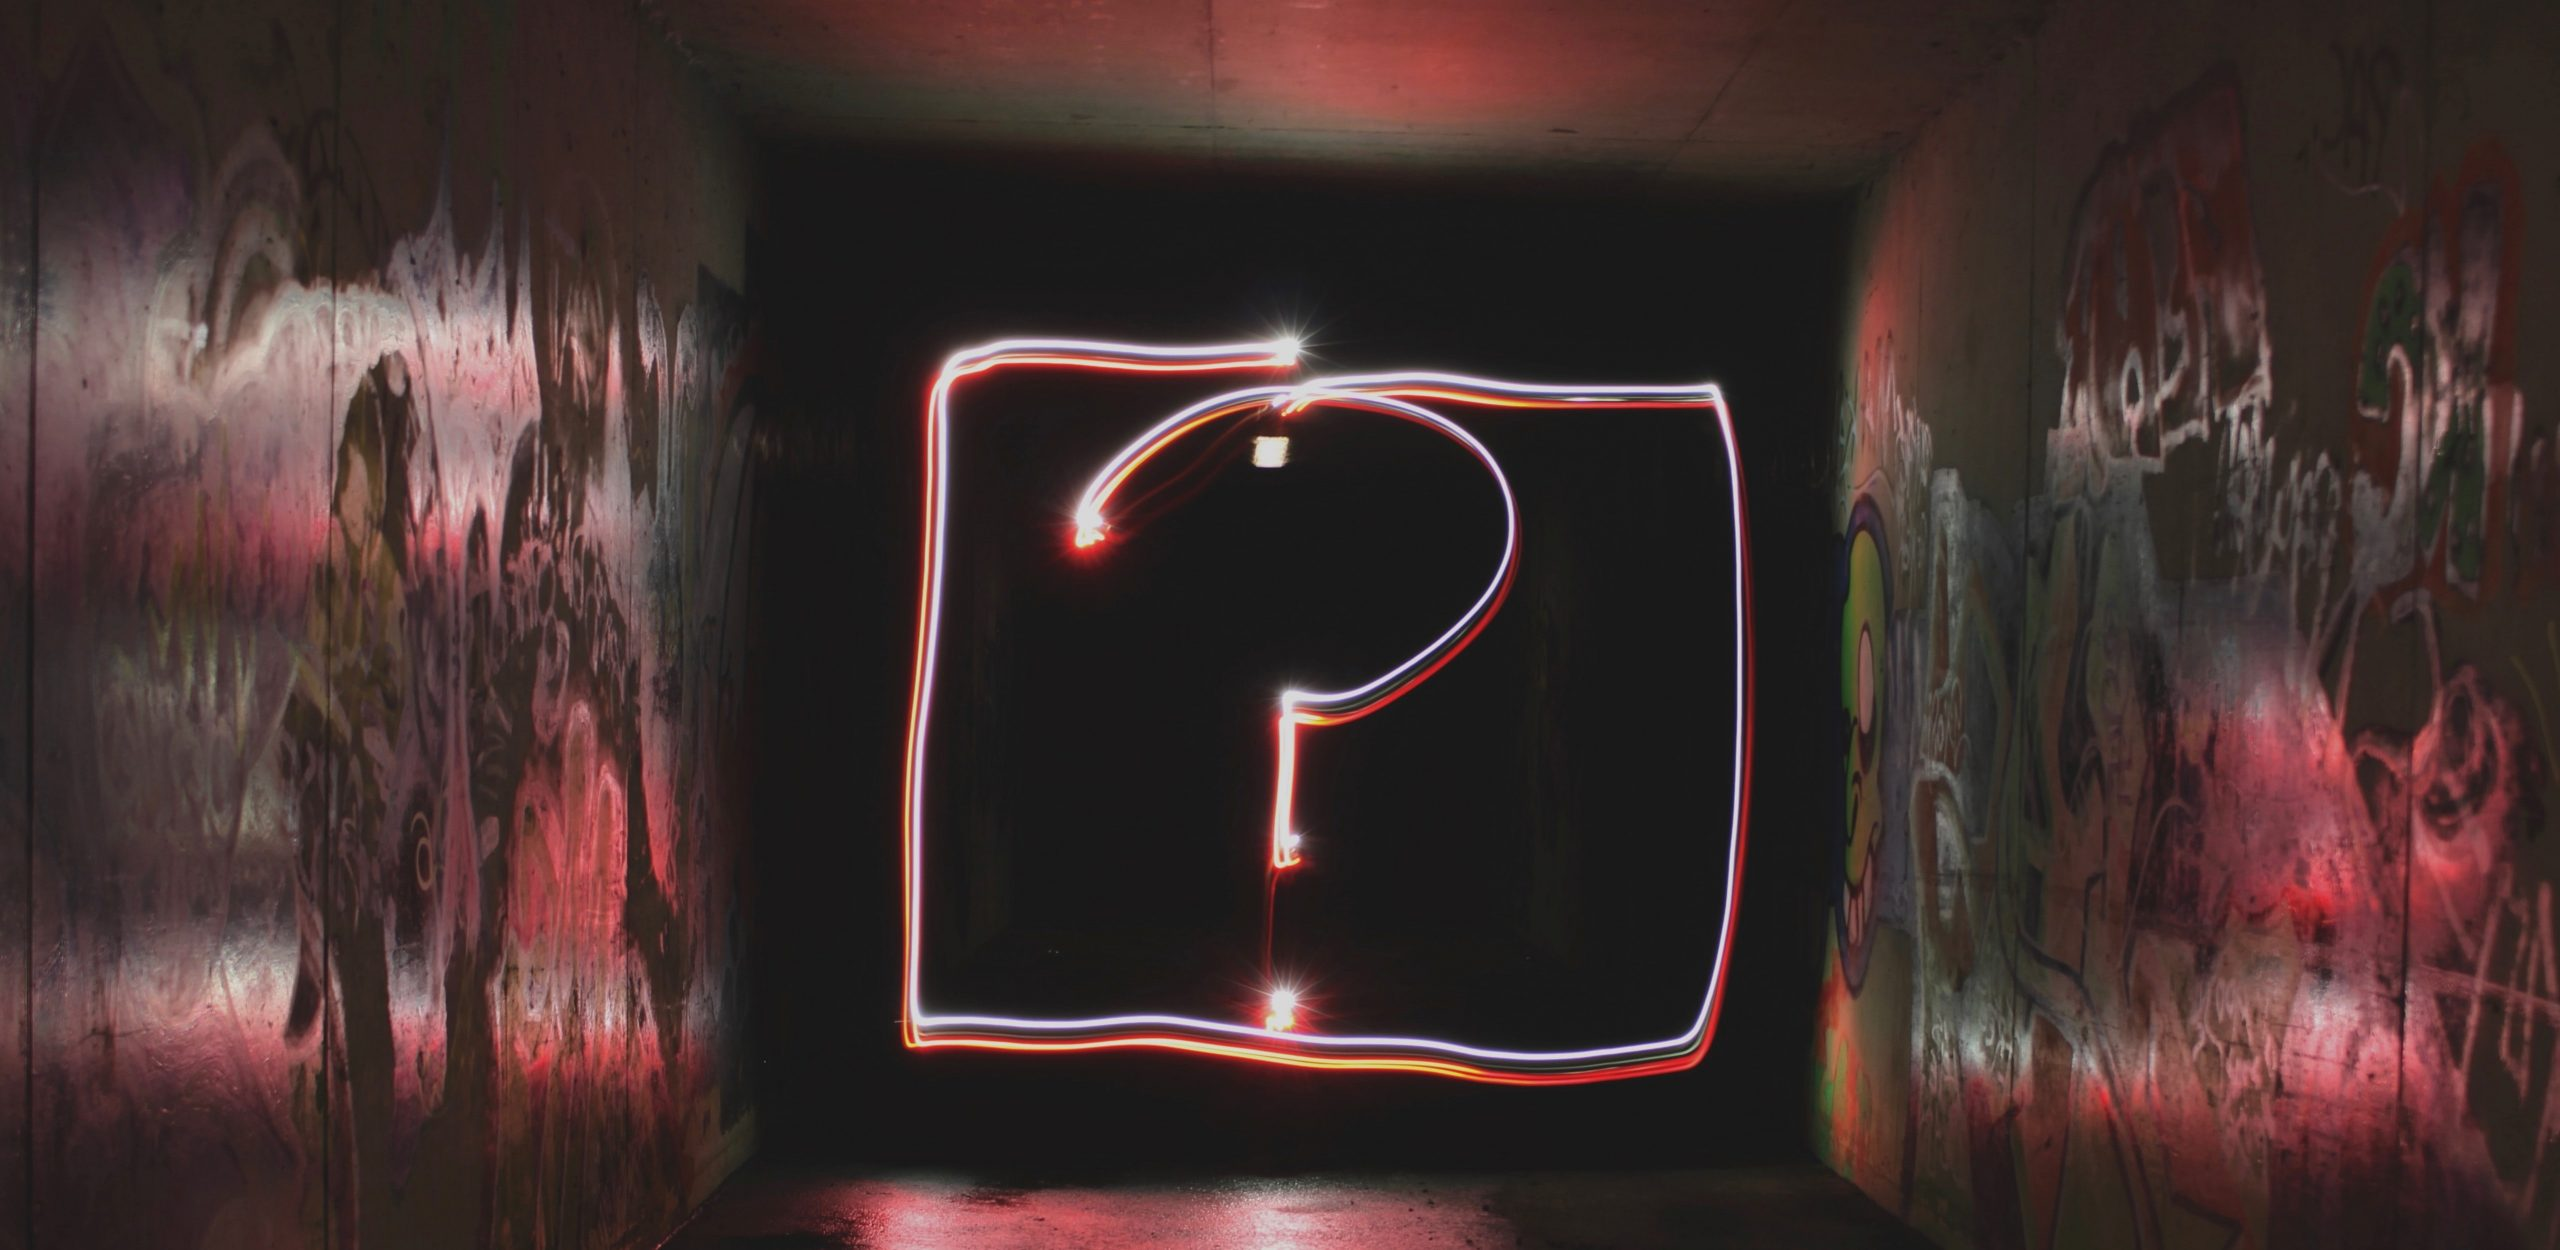 Personality Disorders FAQ's